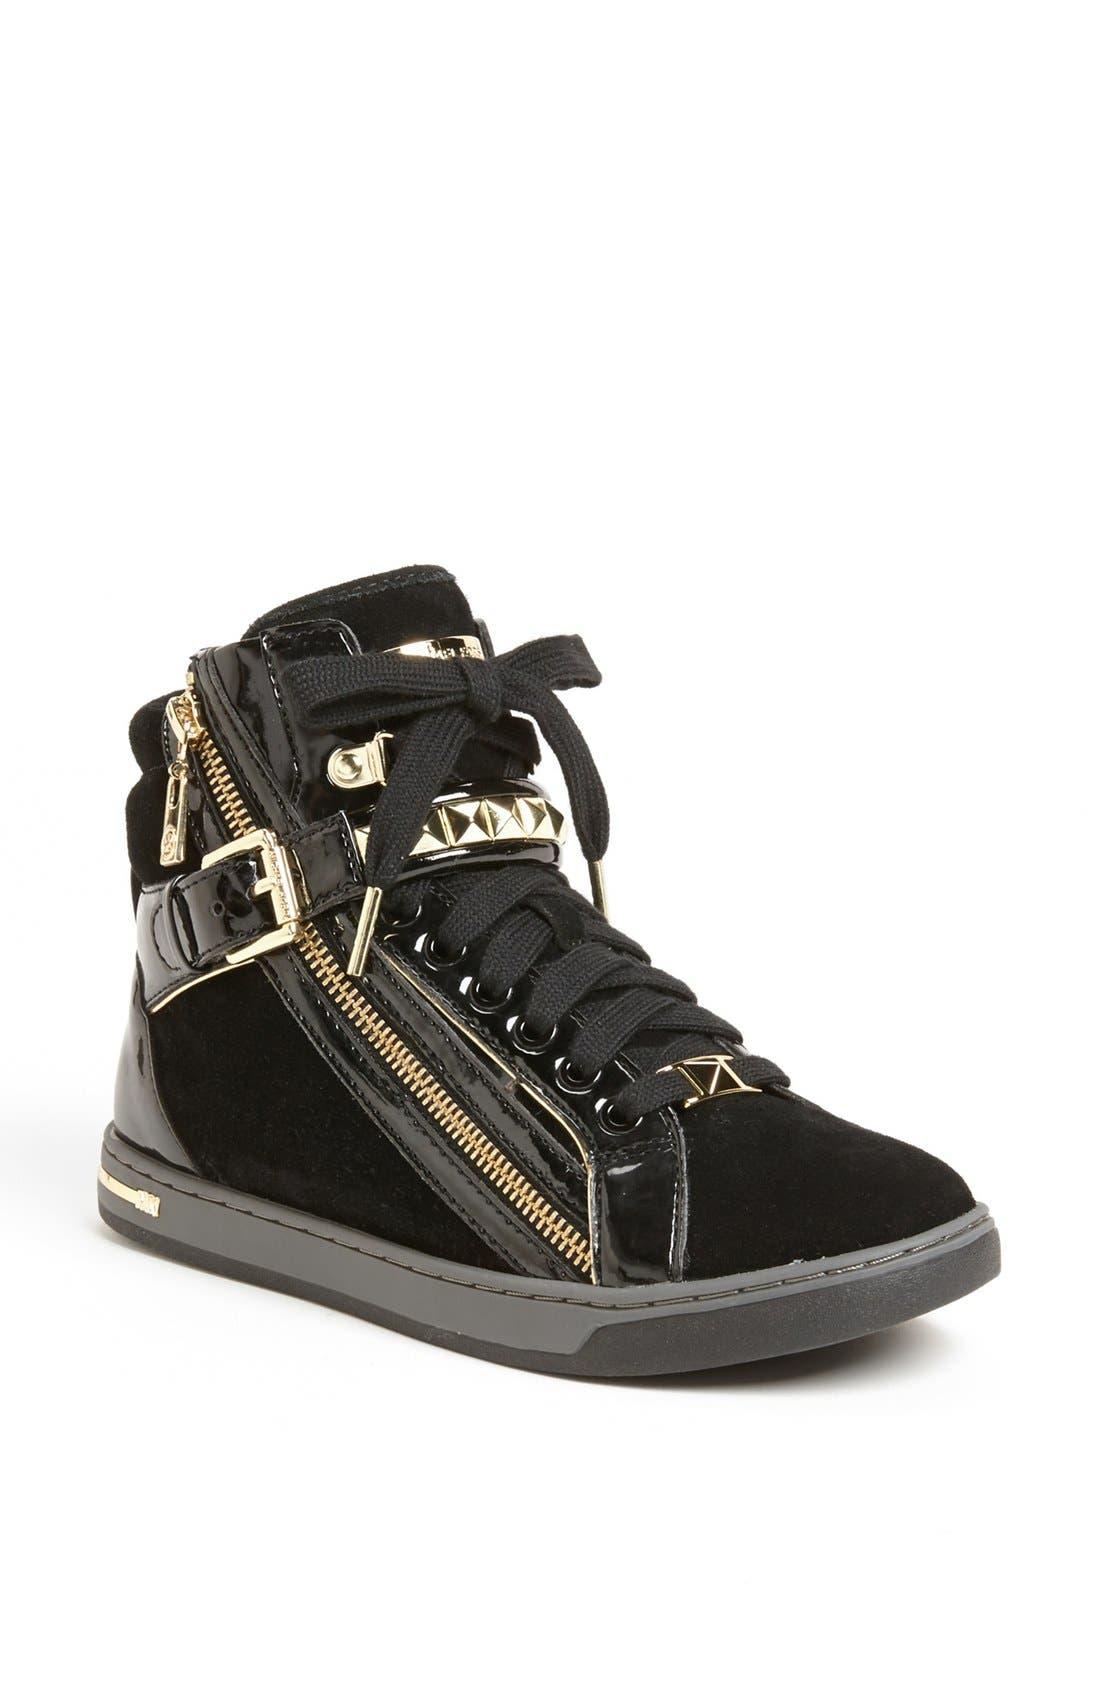 Alternate Image 1 Selected - MICHAEL Michael Kors 'Glam' Studded High Top Sneaker